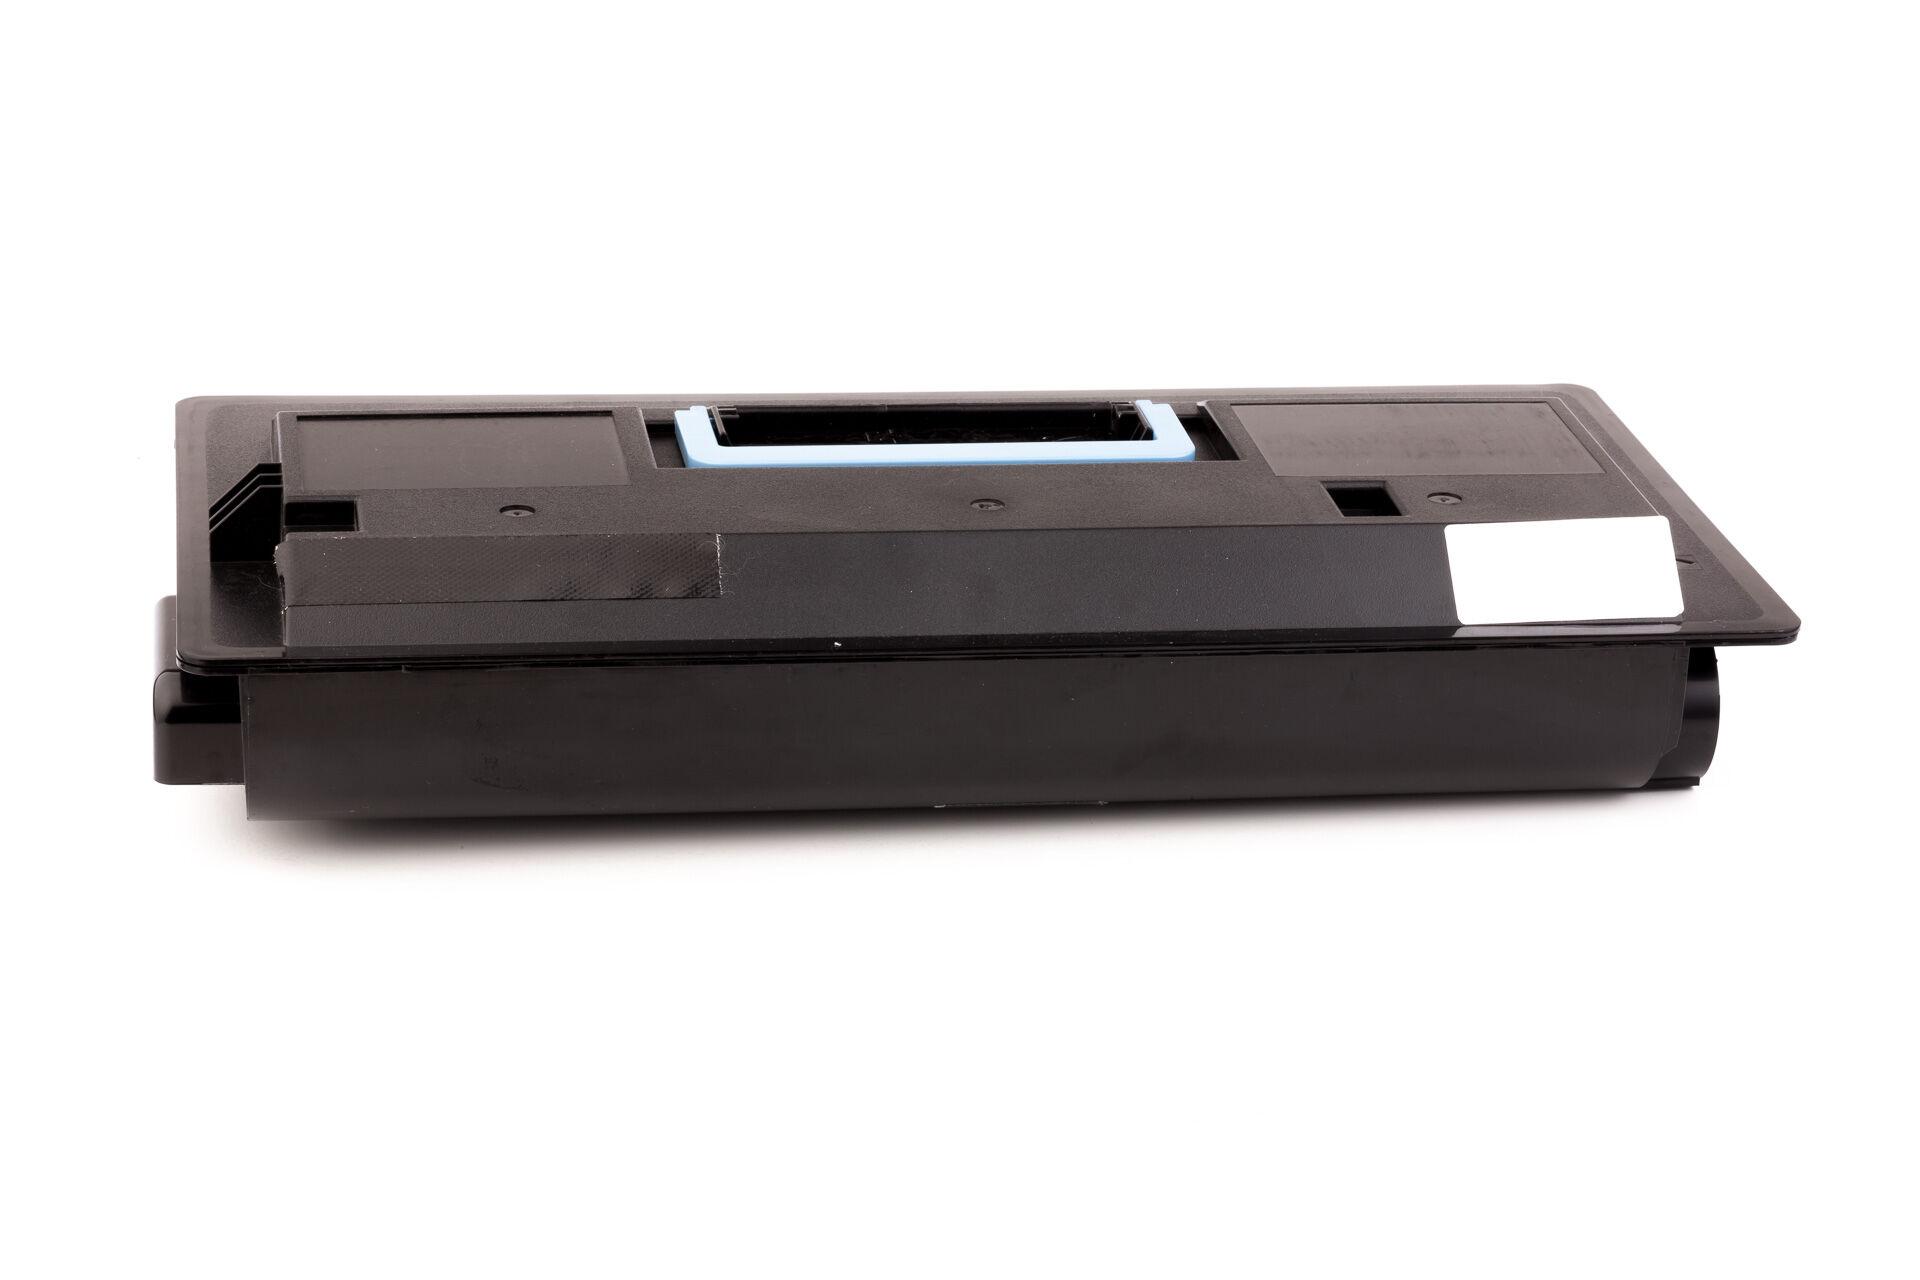 Kyocera Cartouche de Toner pour Kyocera 370AB000 / 5PLPXLMAPKX noir compatible (de marque ASC)